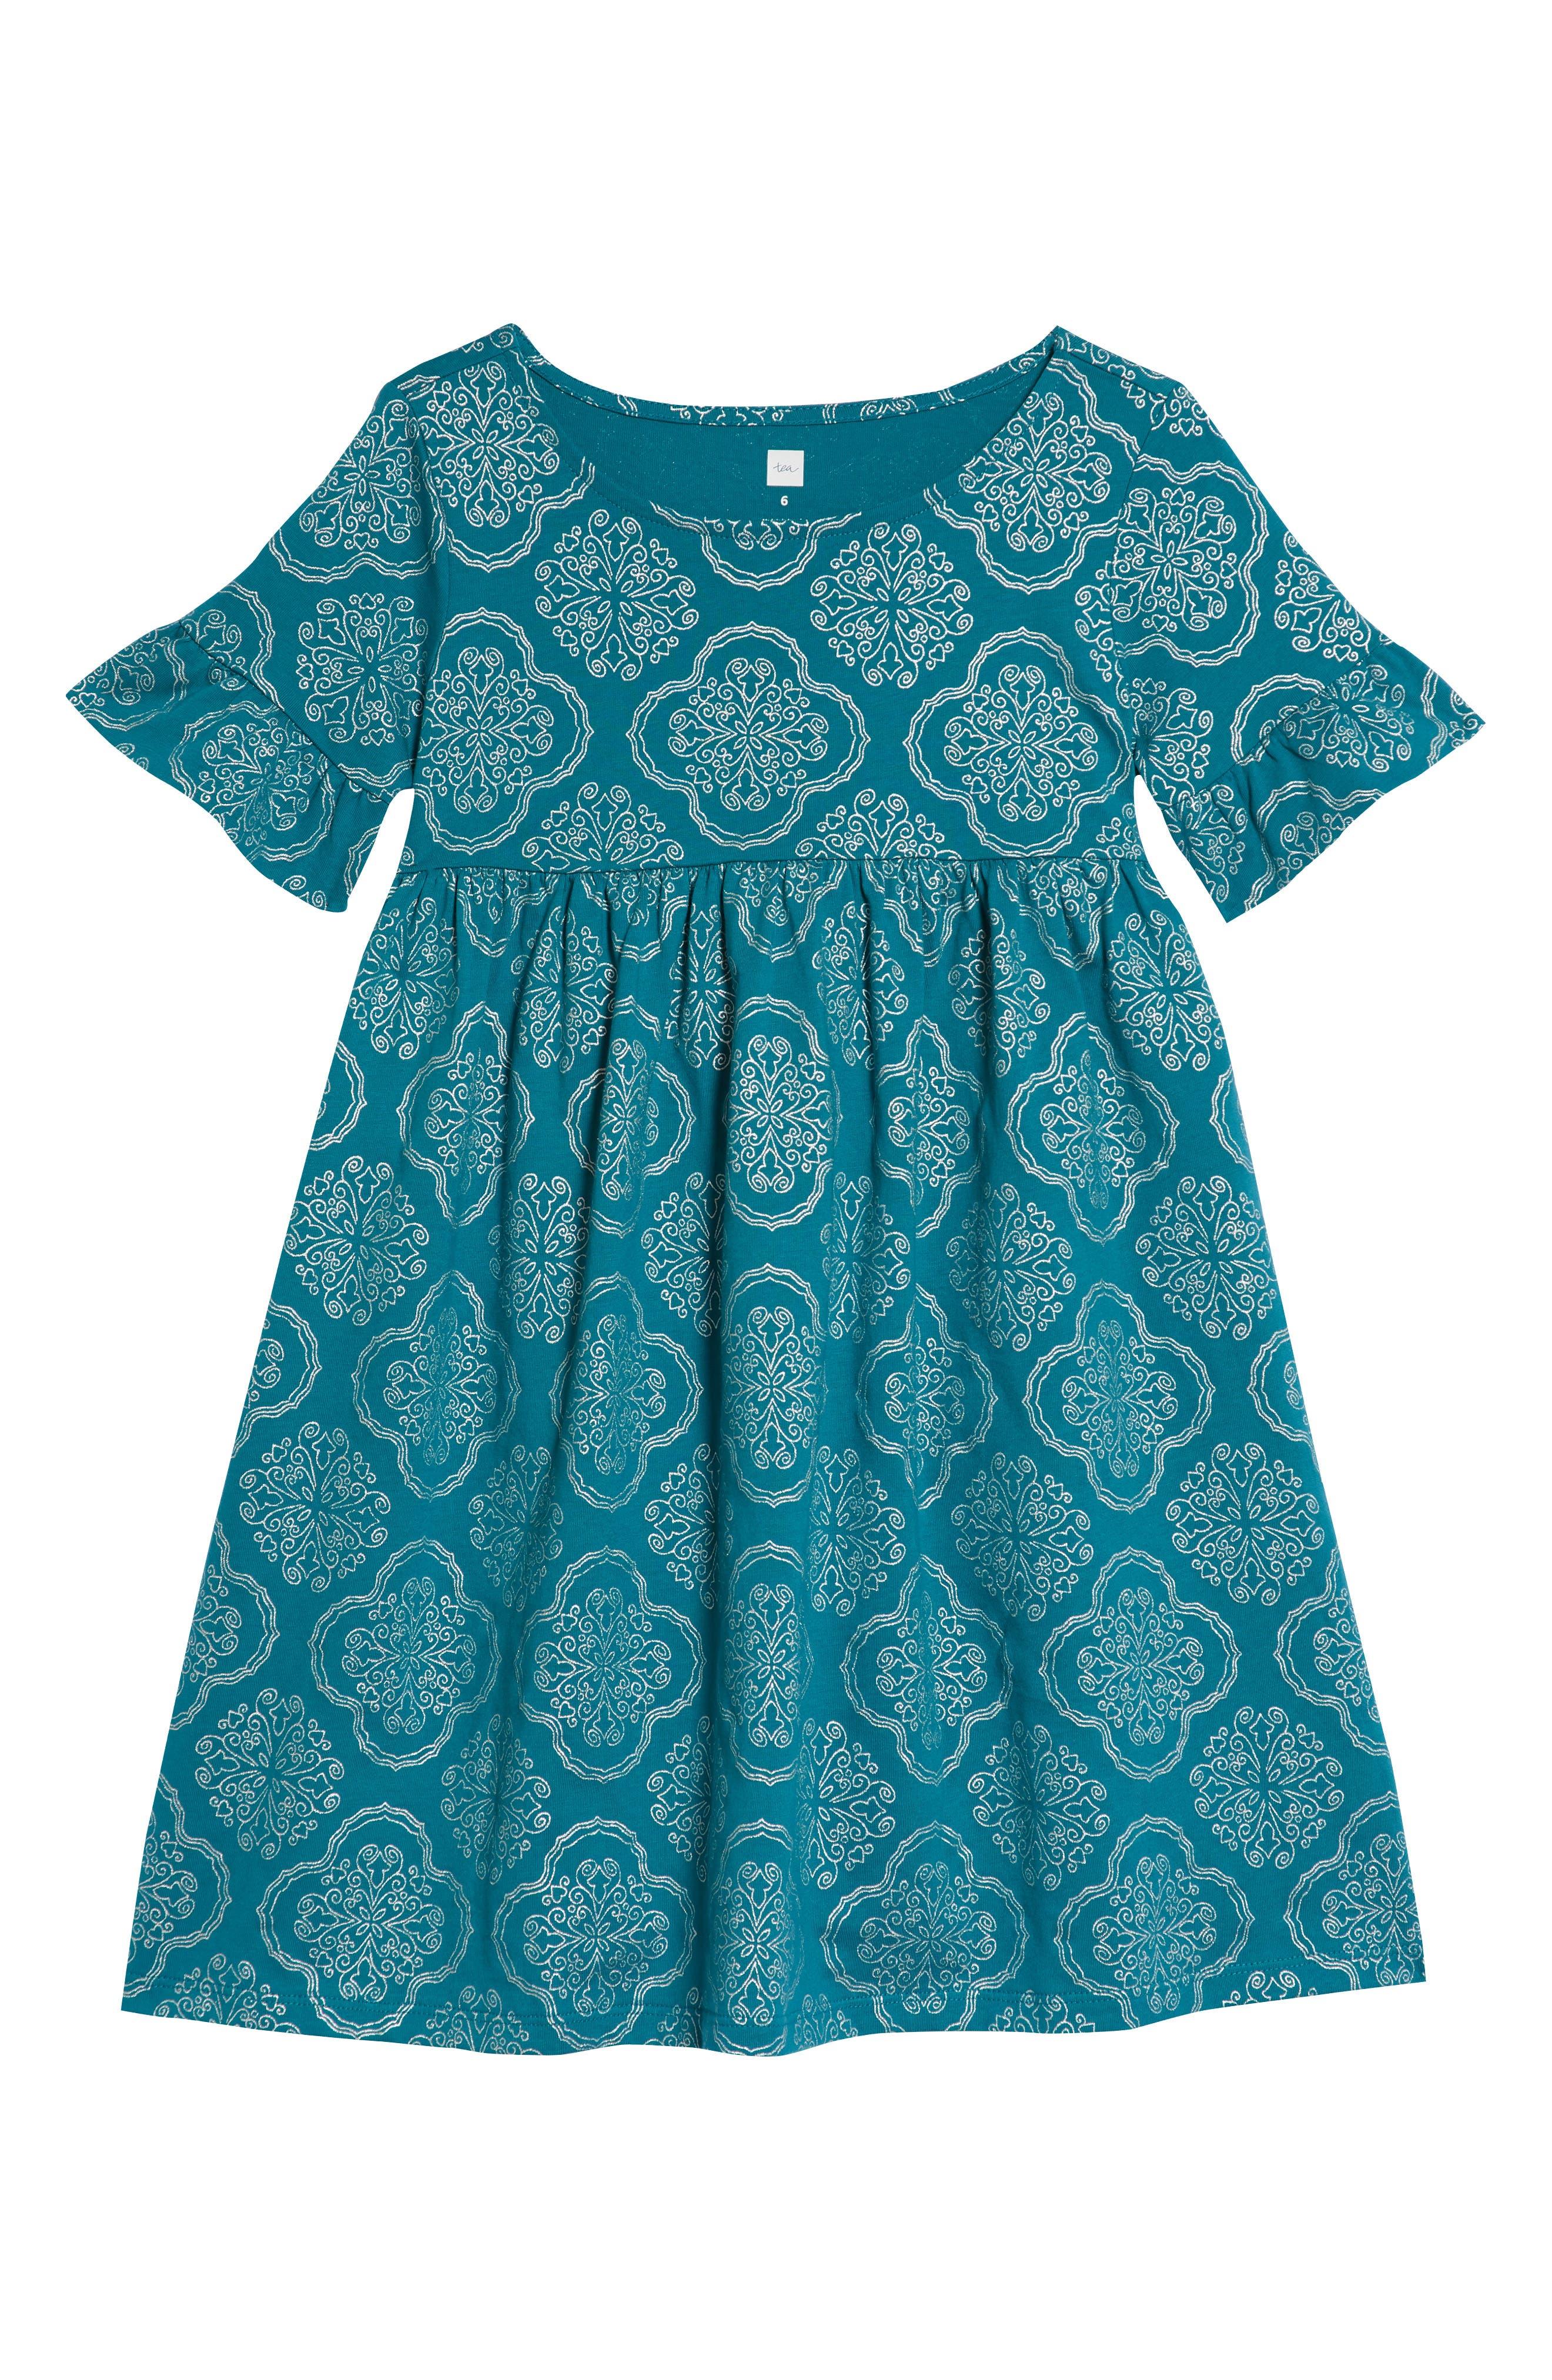 Ruffle Sleeve Dress,                         Main,                         color,